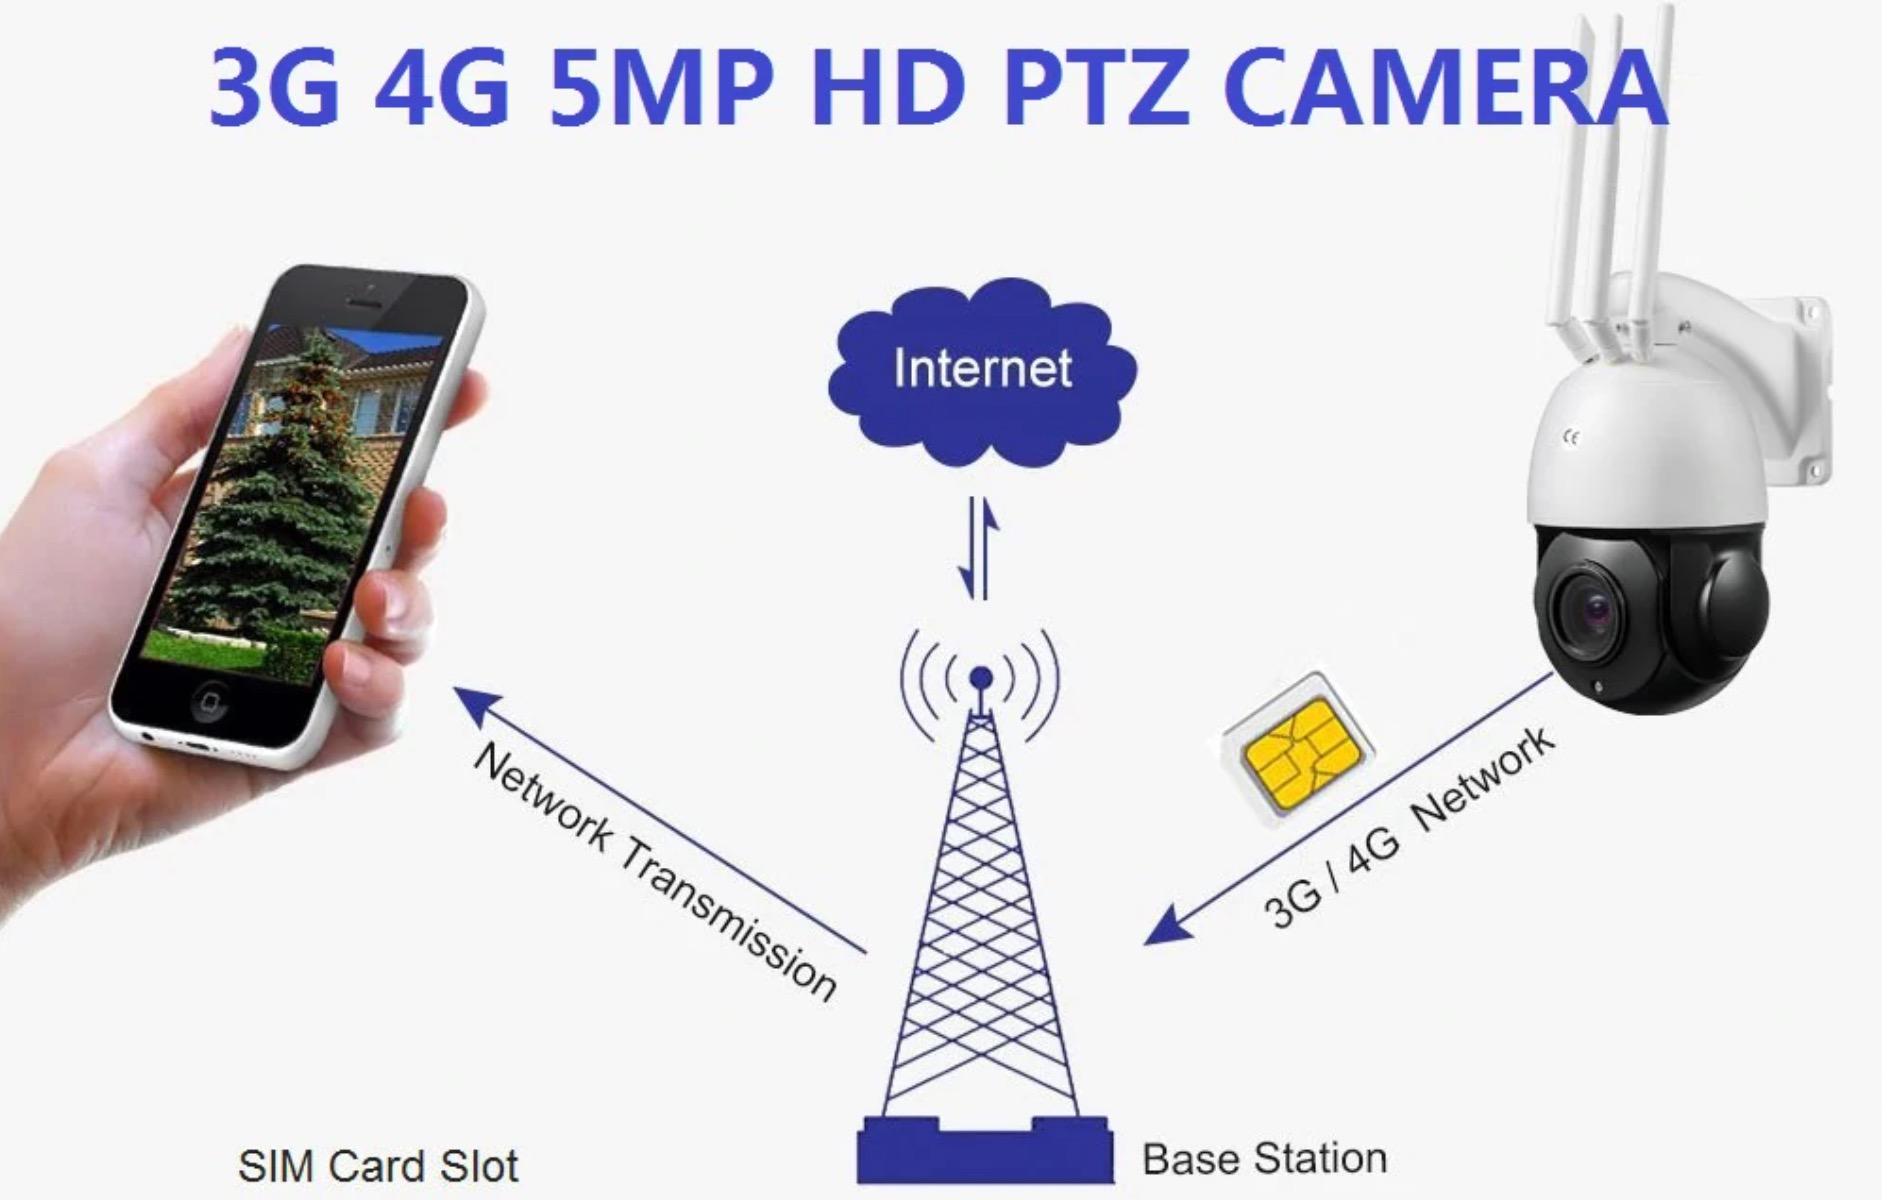 3G 4G 5MP PTZ Camera